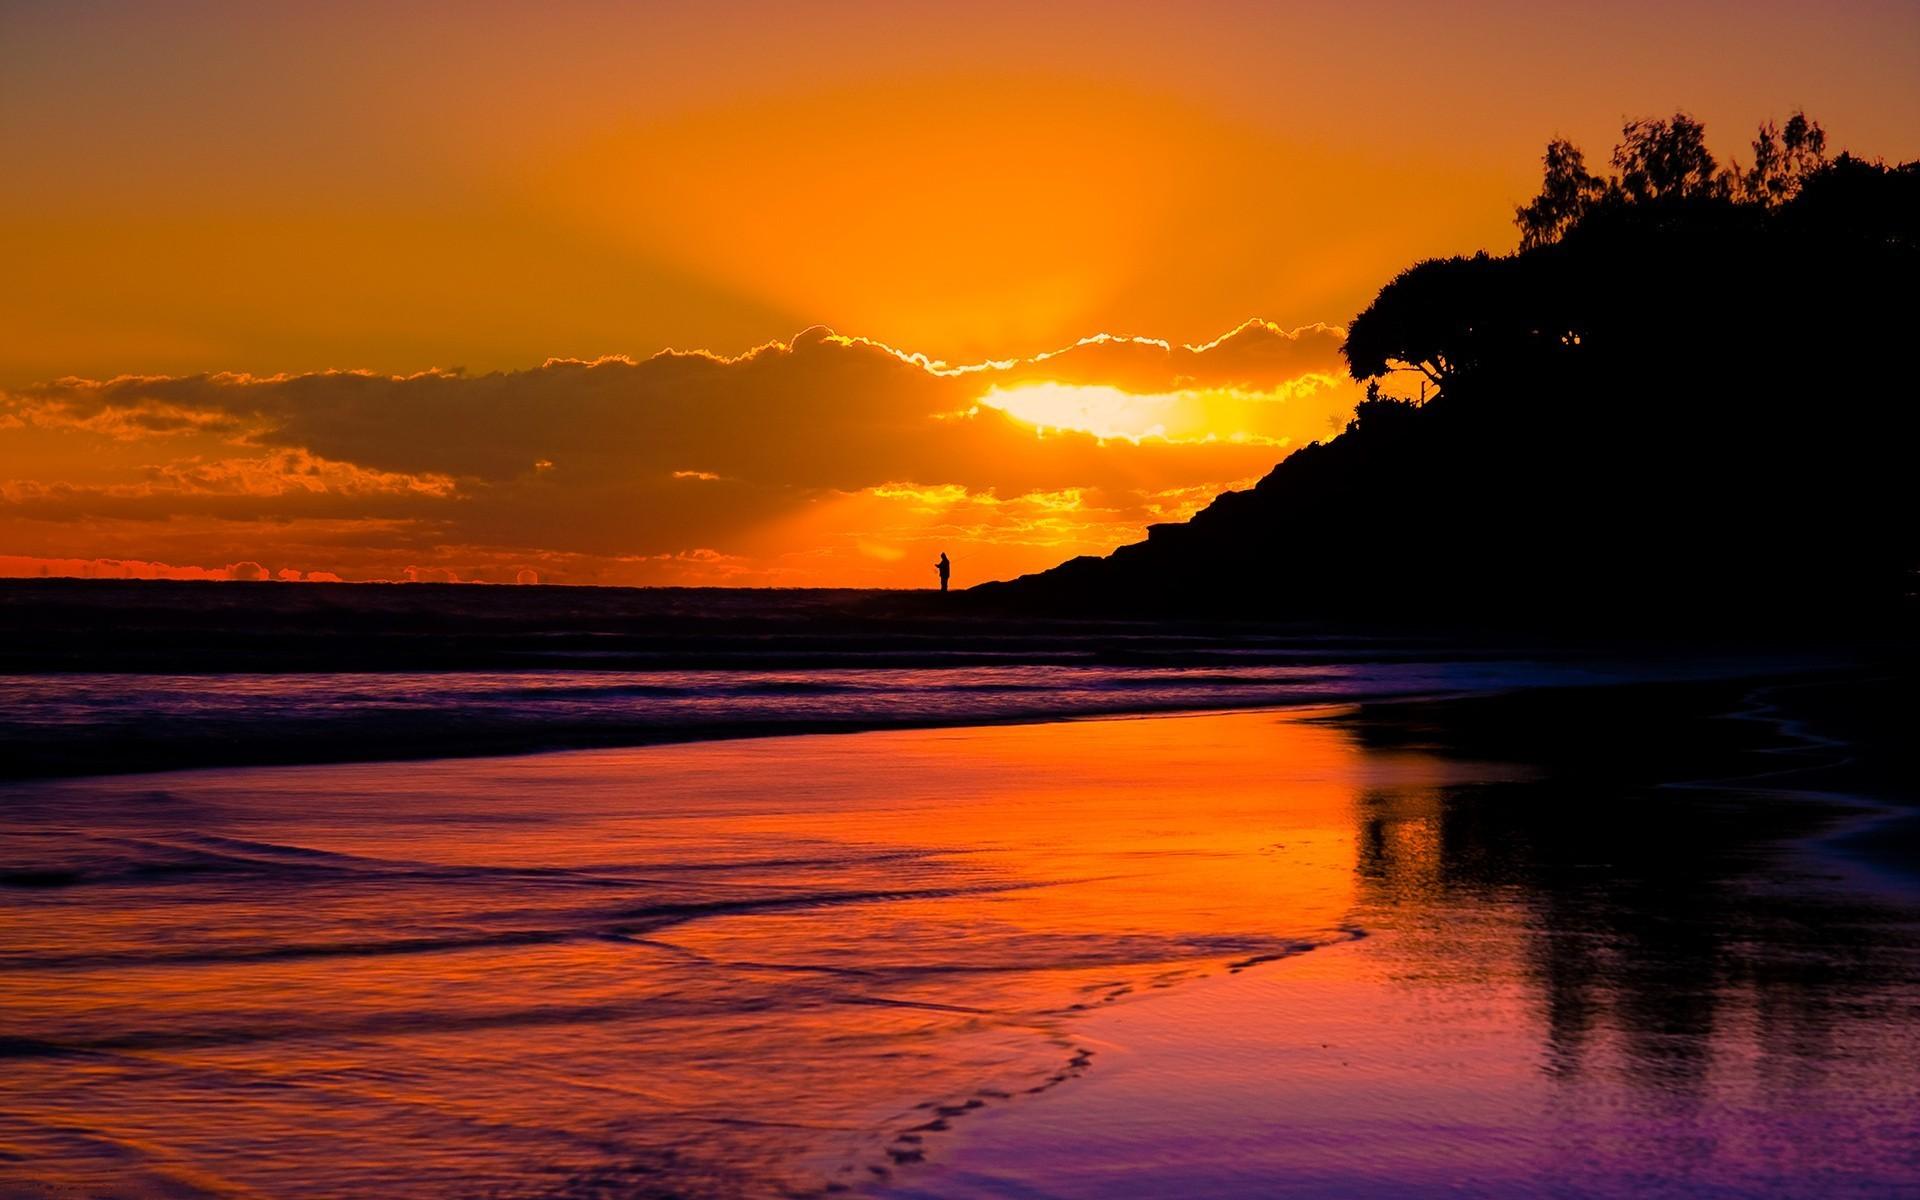 Beach Screensavers And Wallpapers Sunset Beach photos of Refresh 1920x1200